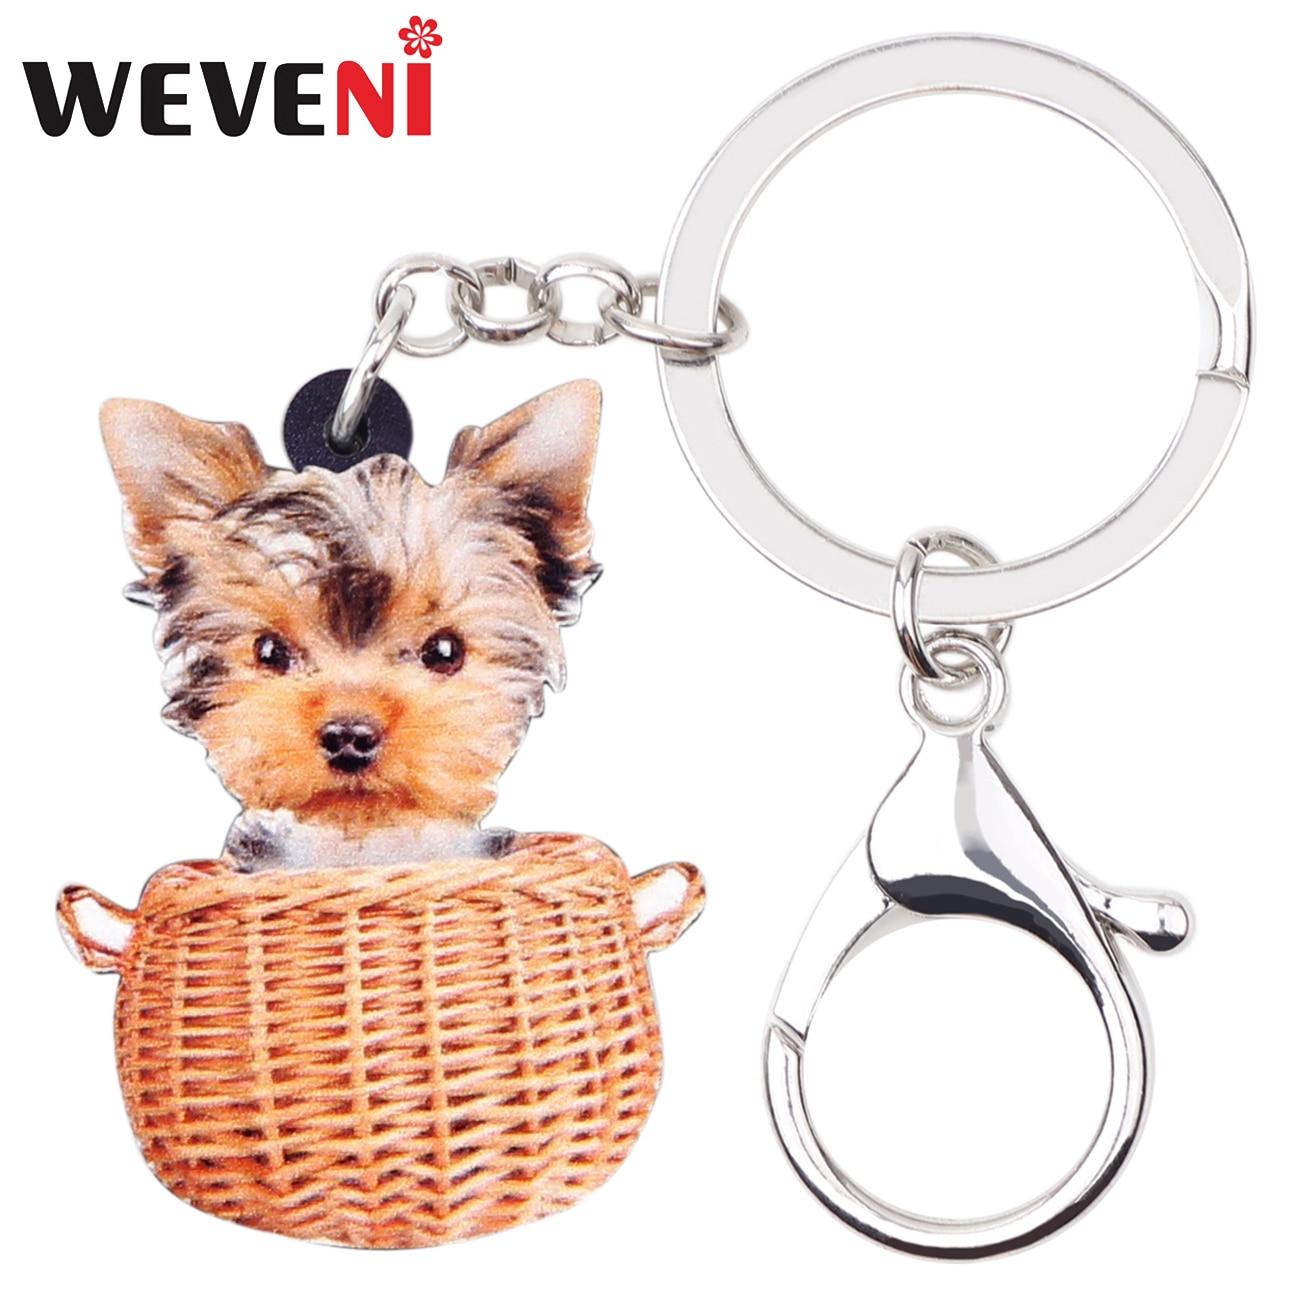 WEVENI Acrylic Basket Yorkshire Dog Key Chains Keychains Holder Cute Animal Jewelry For Women Girls Pet Lovers Bag Car Pendant